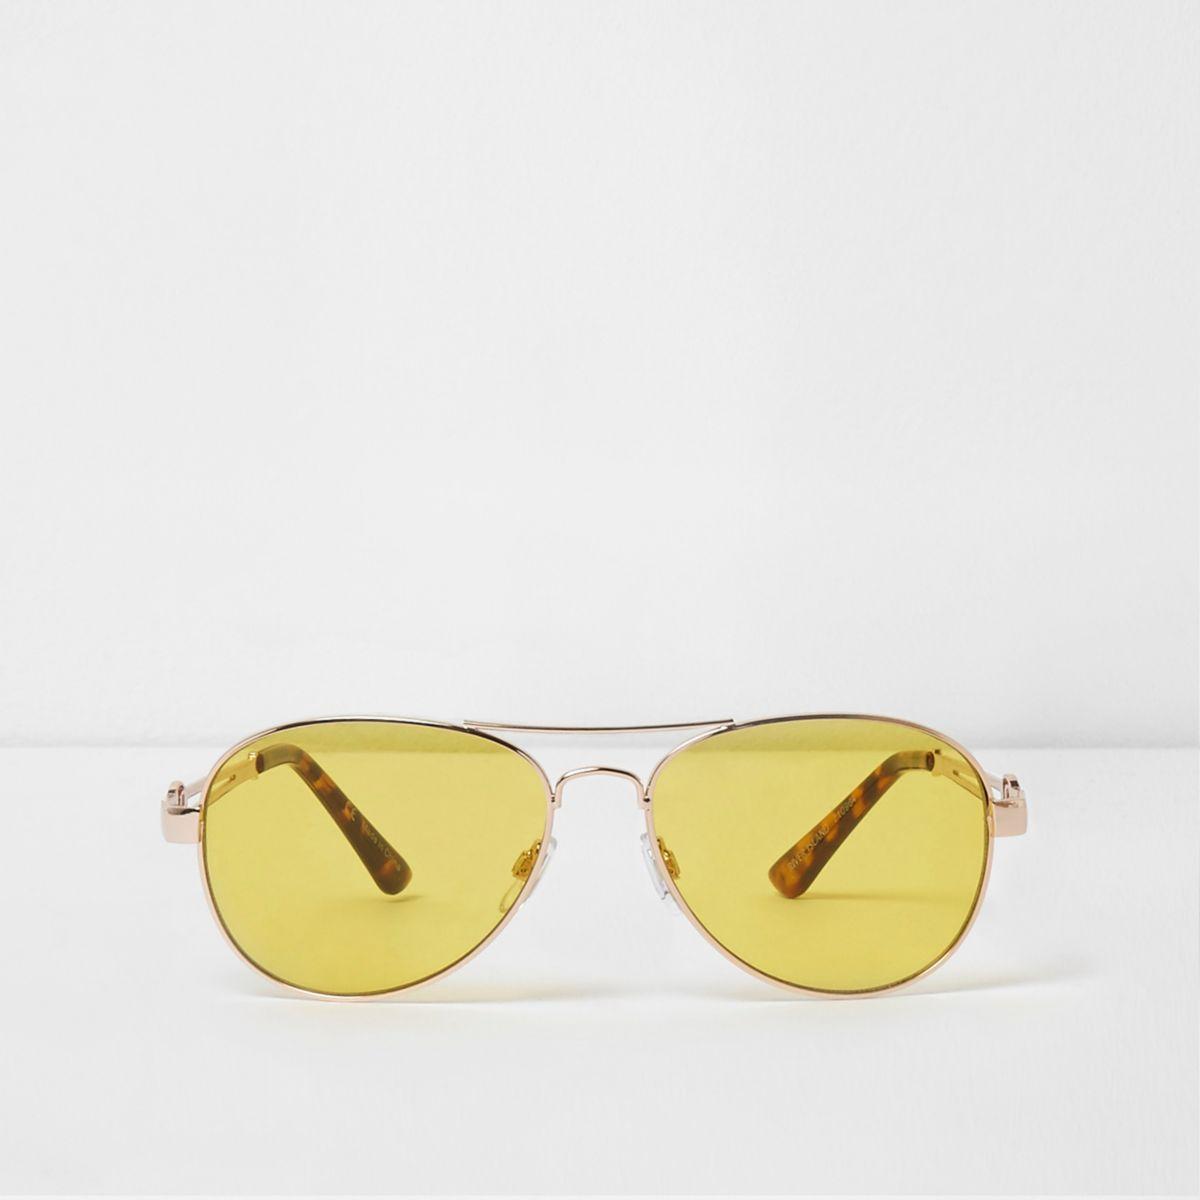 Goudkleurige pilotenzonnebril met gele glazen